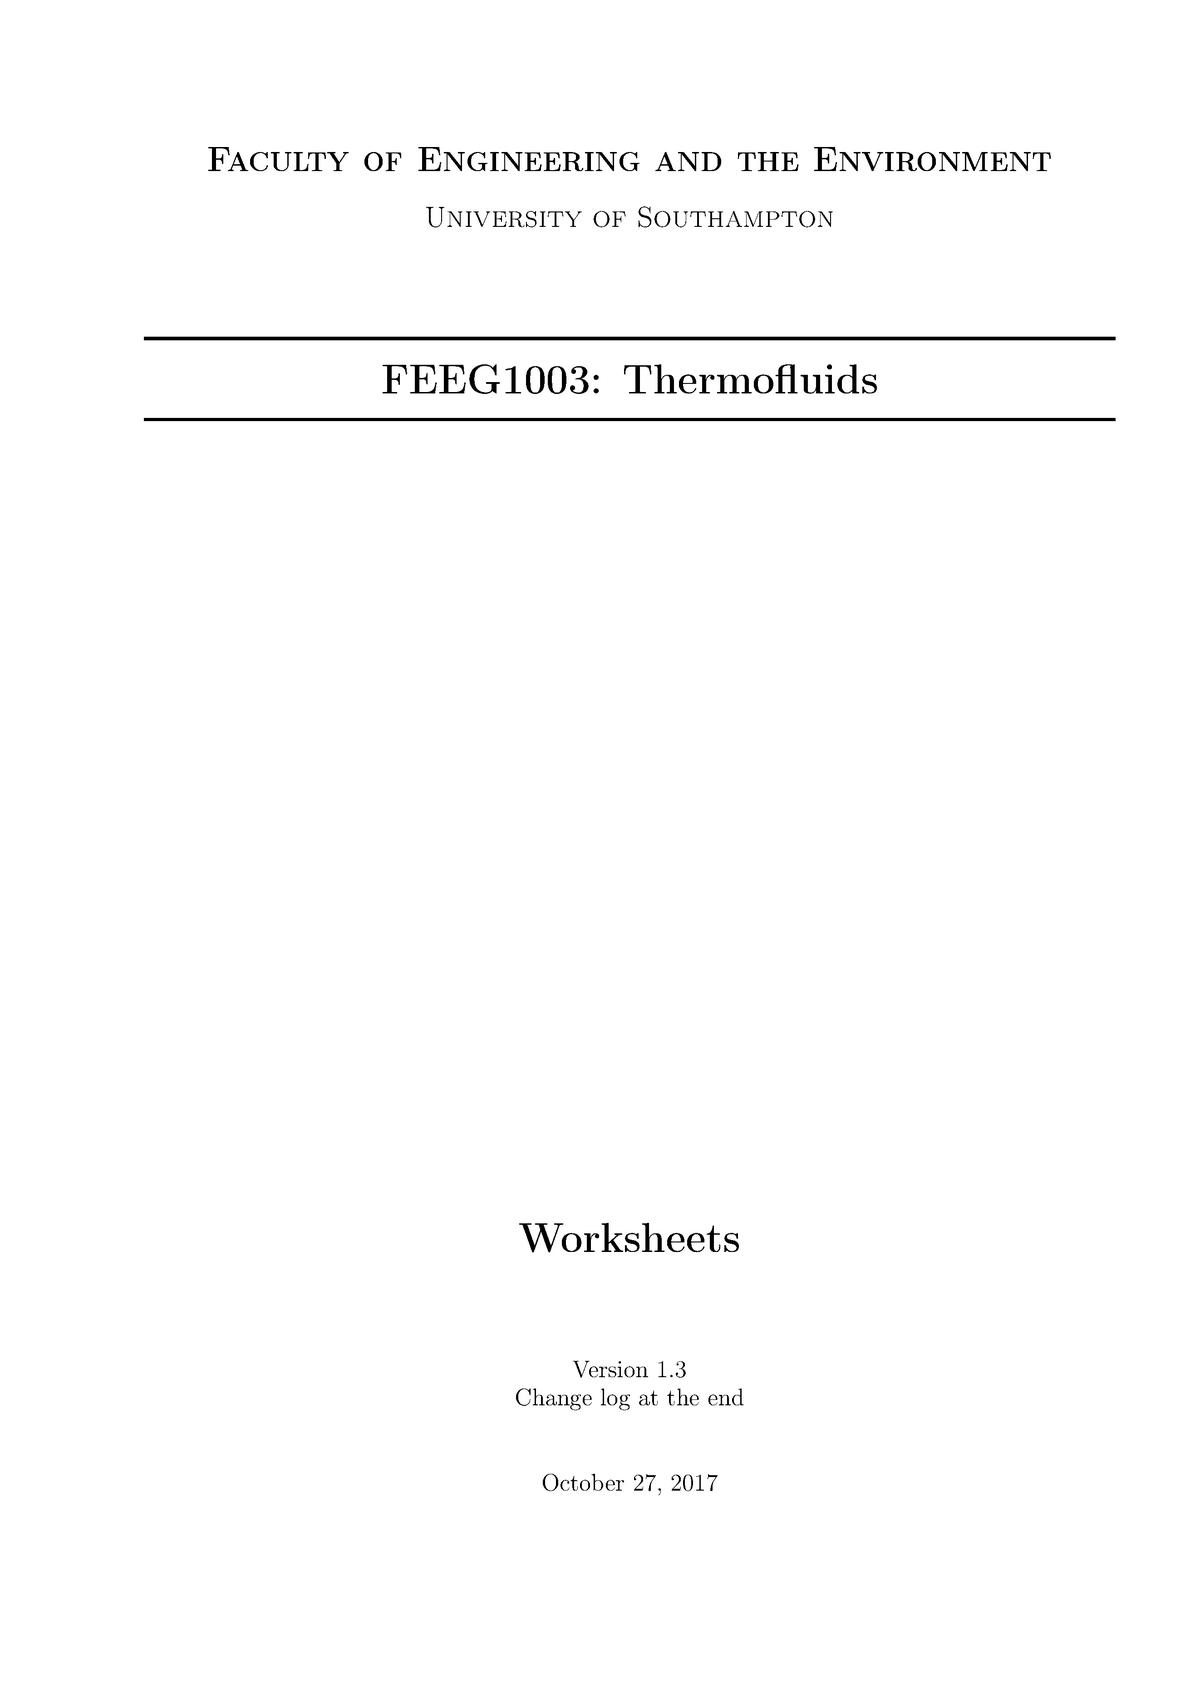 Thermofluids Worksheets 2017 - FEEG1003: Thermofluids - StuDocu